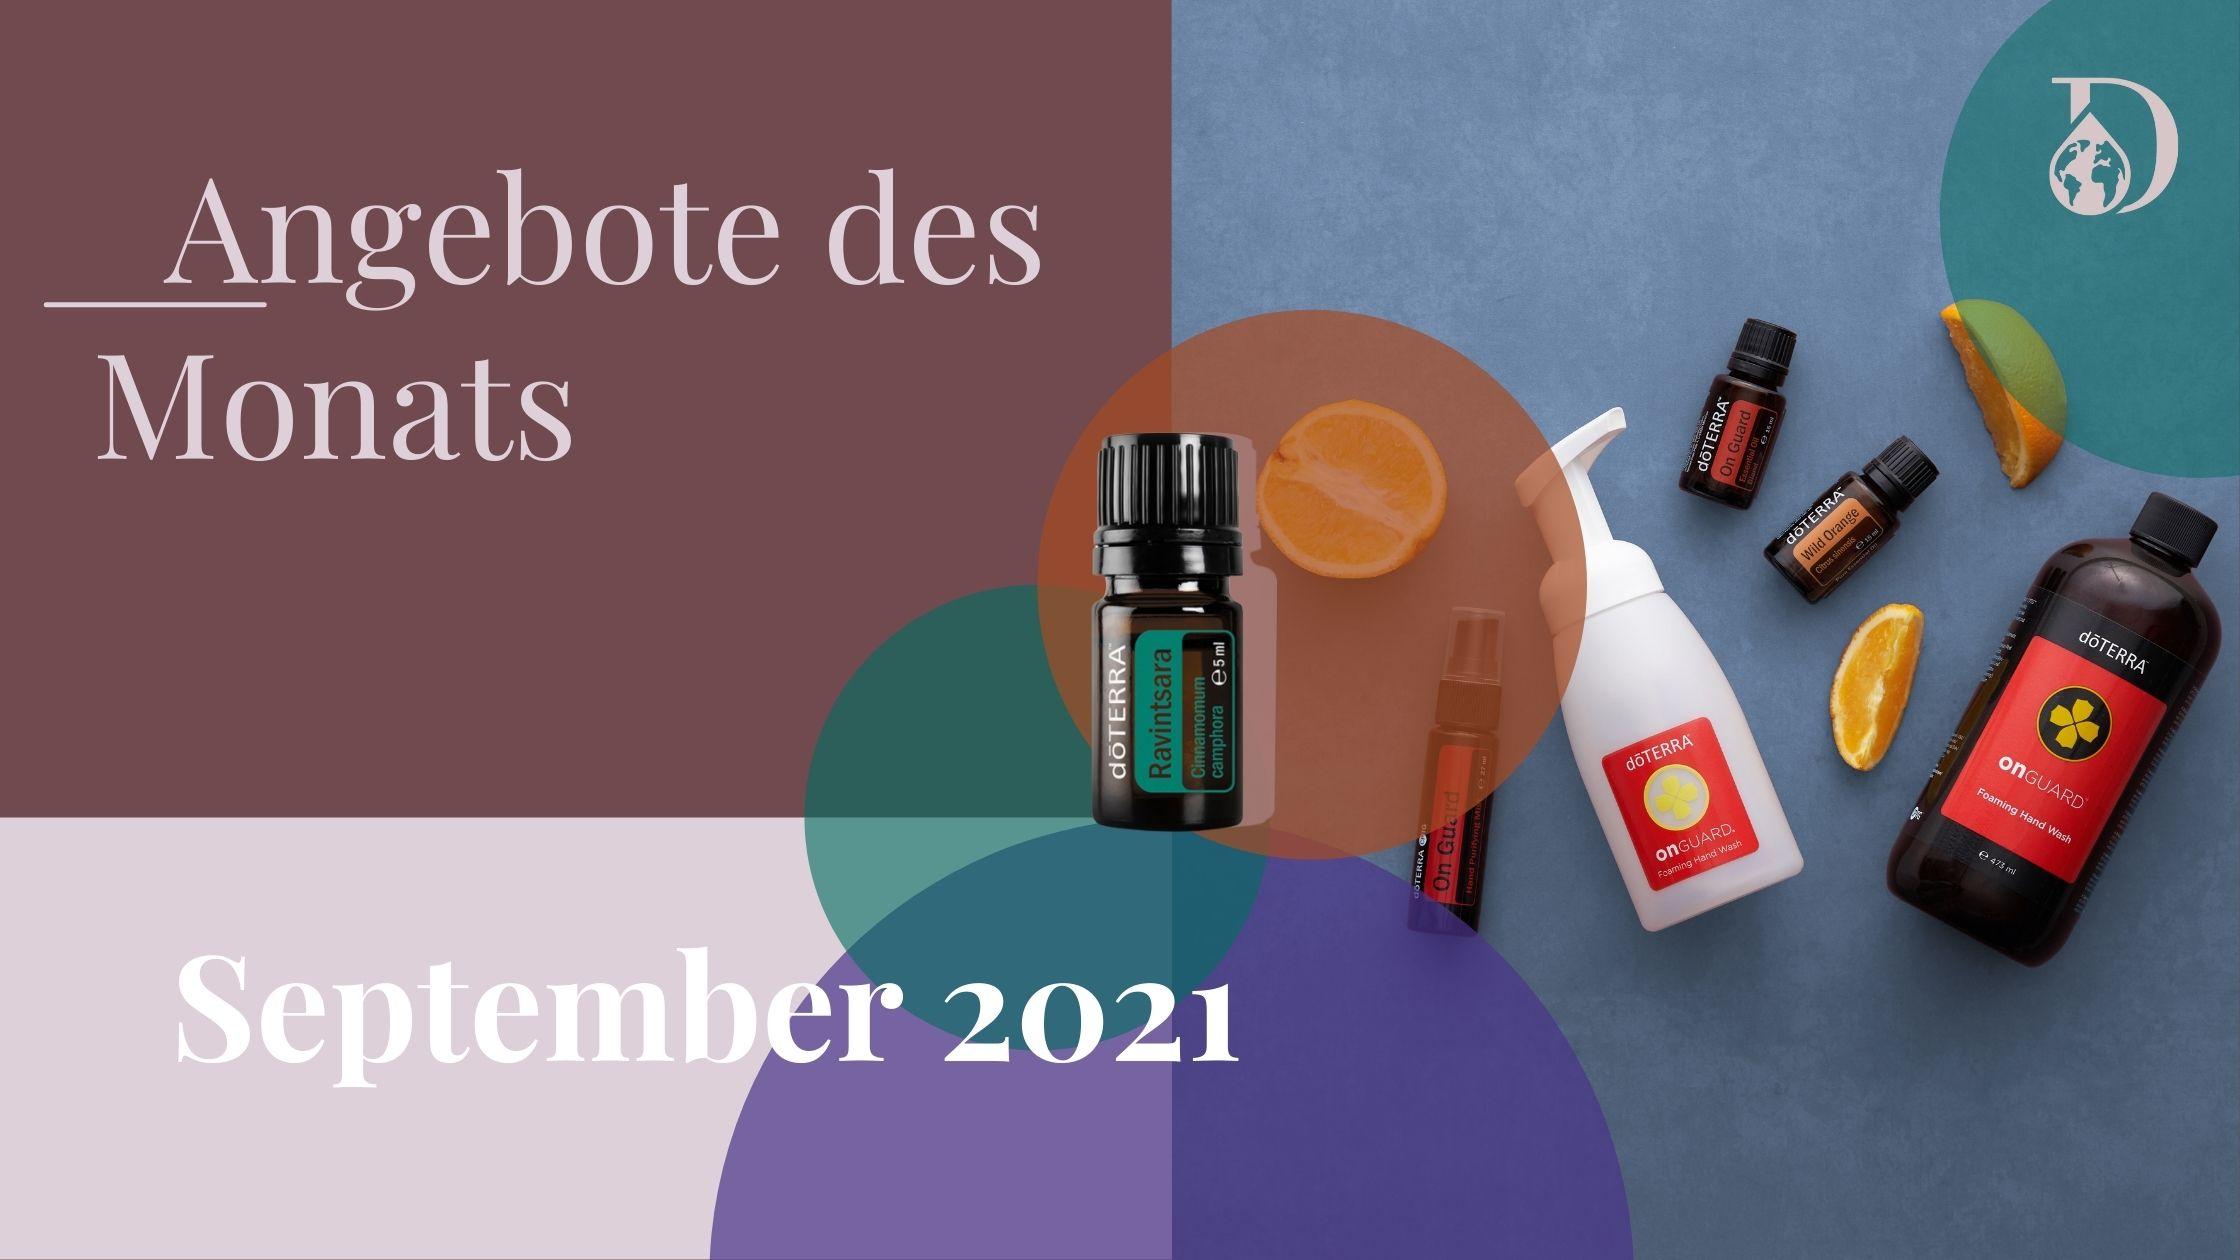 Angebote, News,Events im September 2021